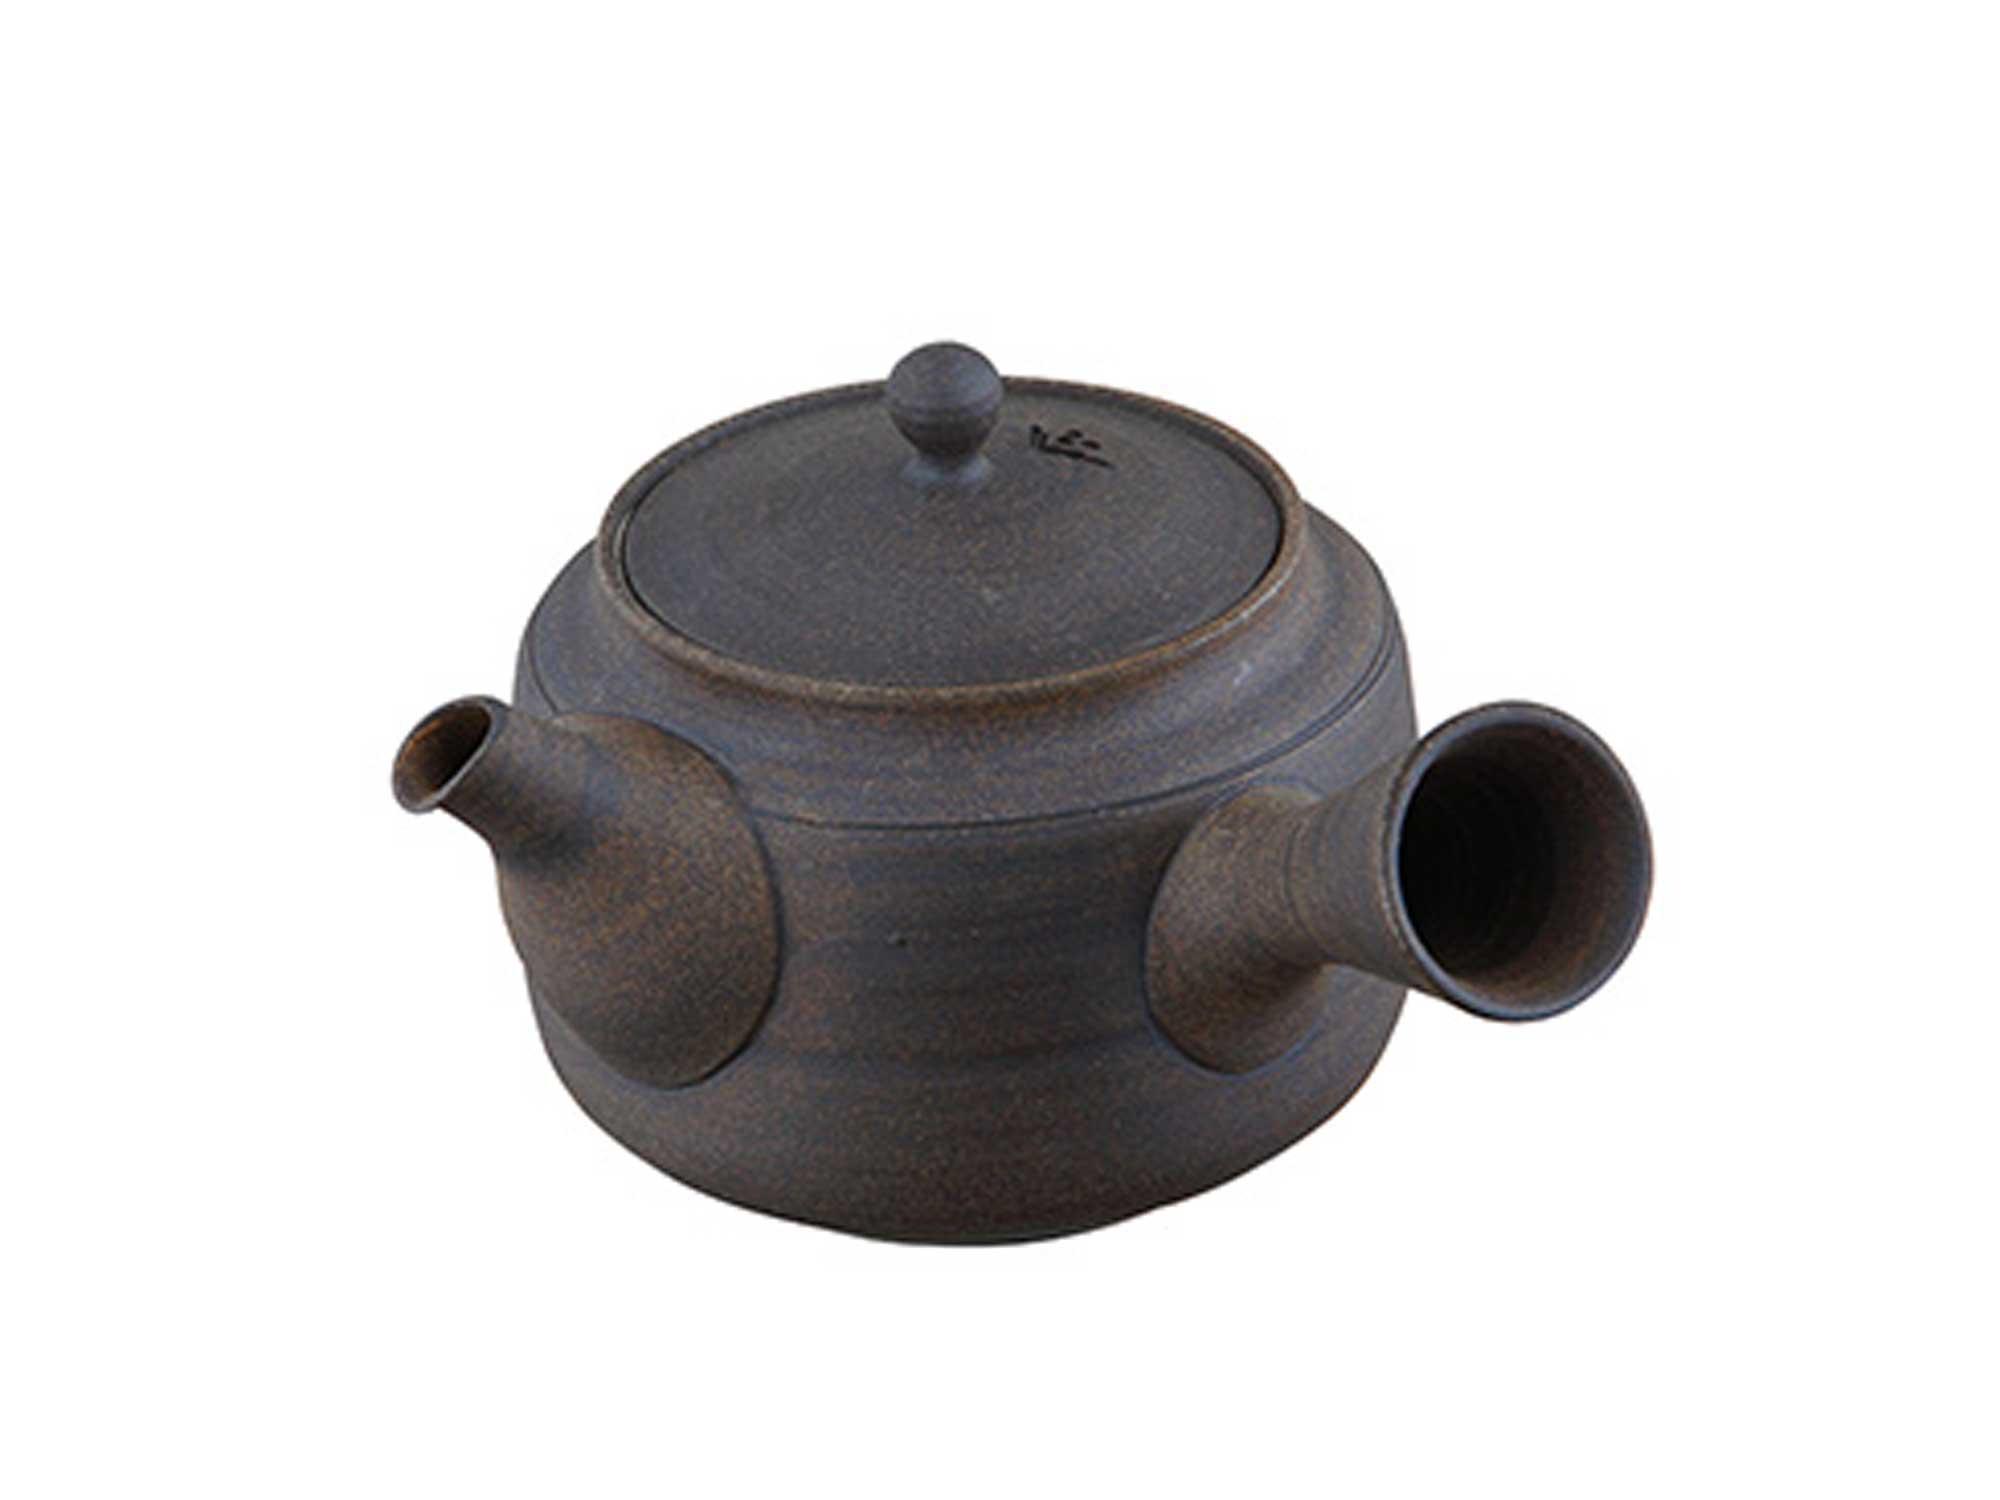 Yakishime Kyusu Teapot